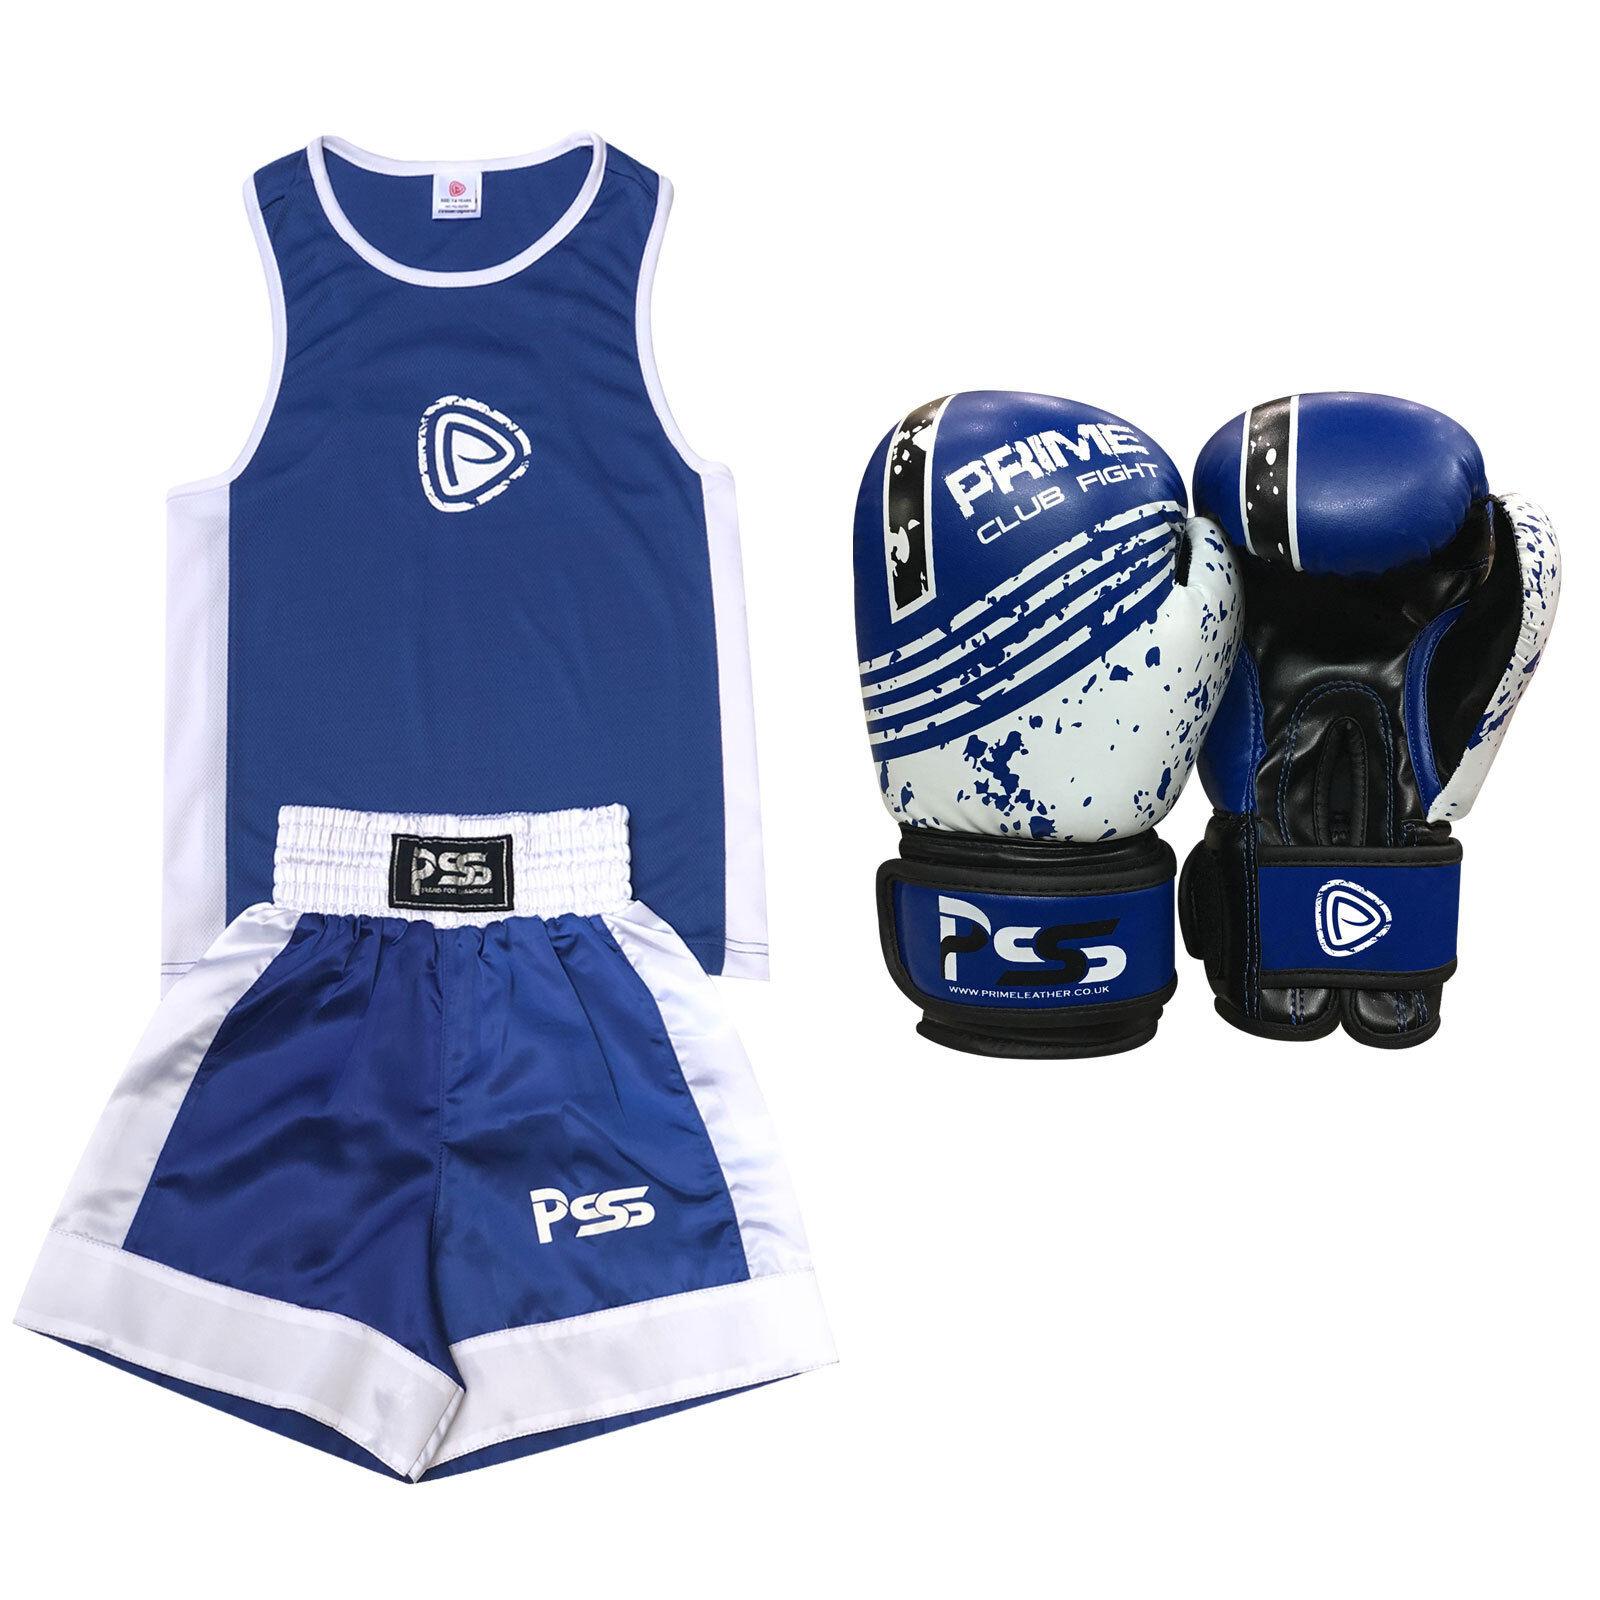 Kinder Uniform Years Set Oberteil & Shorts Alter 3-12 Years Uniform Junior Boxhandschuhe 4/6 0f998e